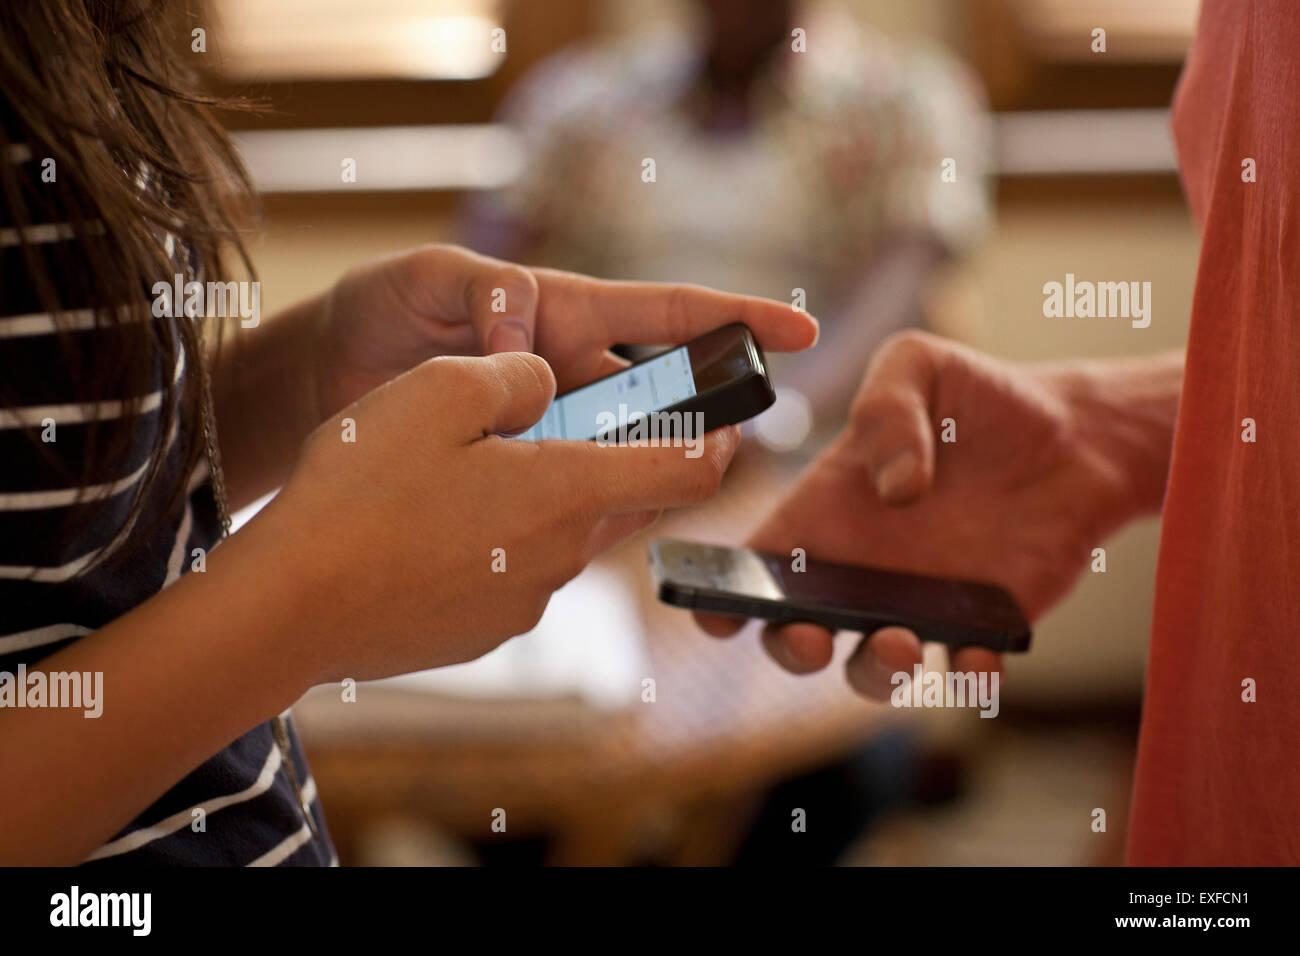 Student using smartphones - Stock Image